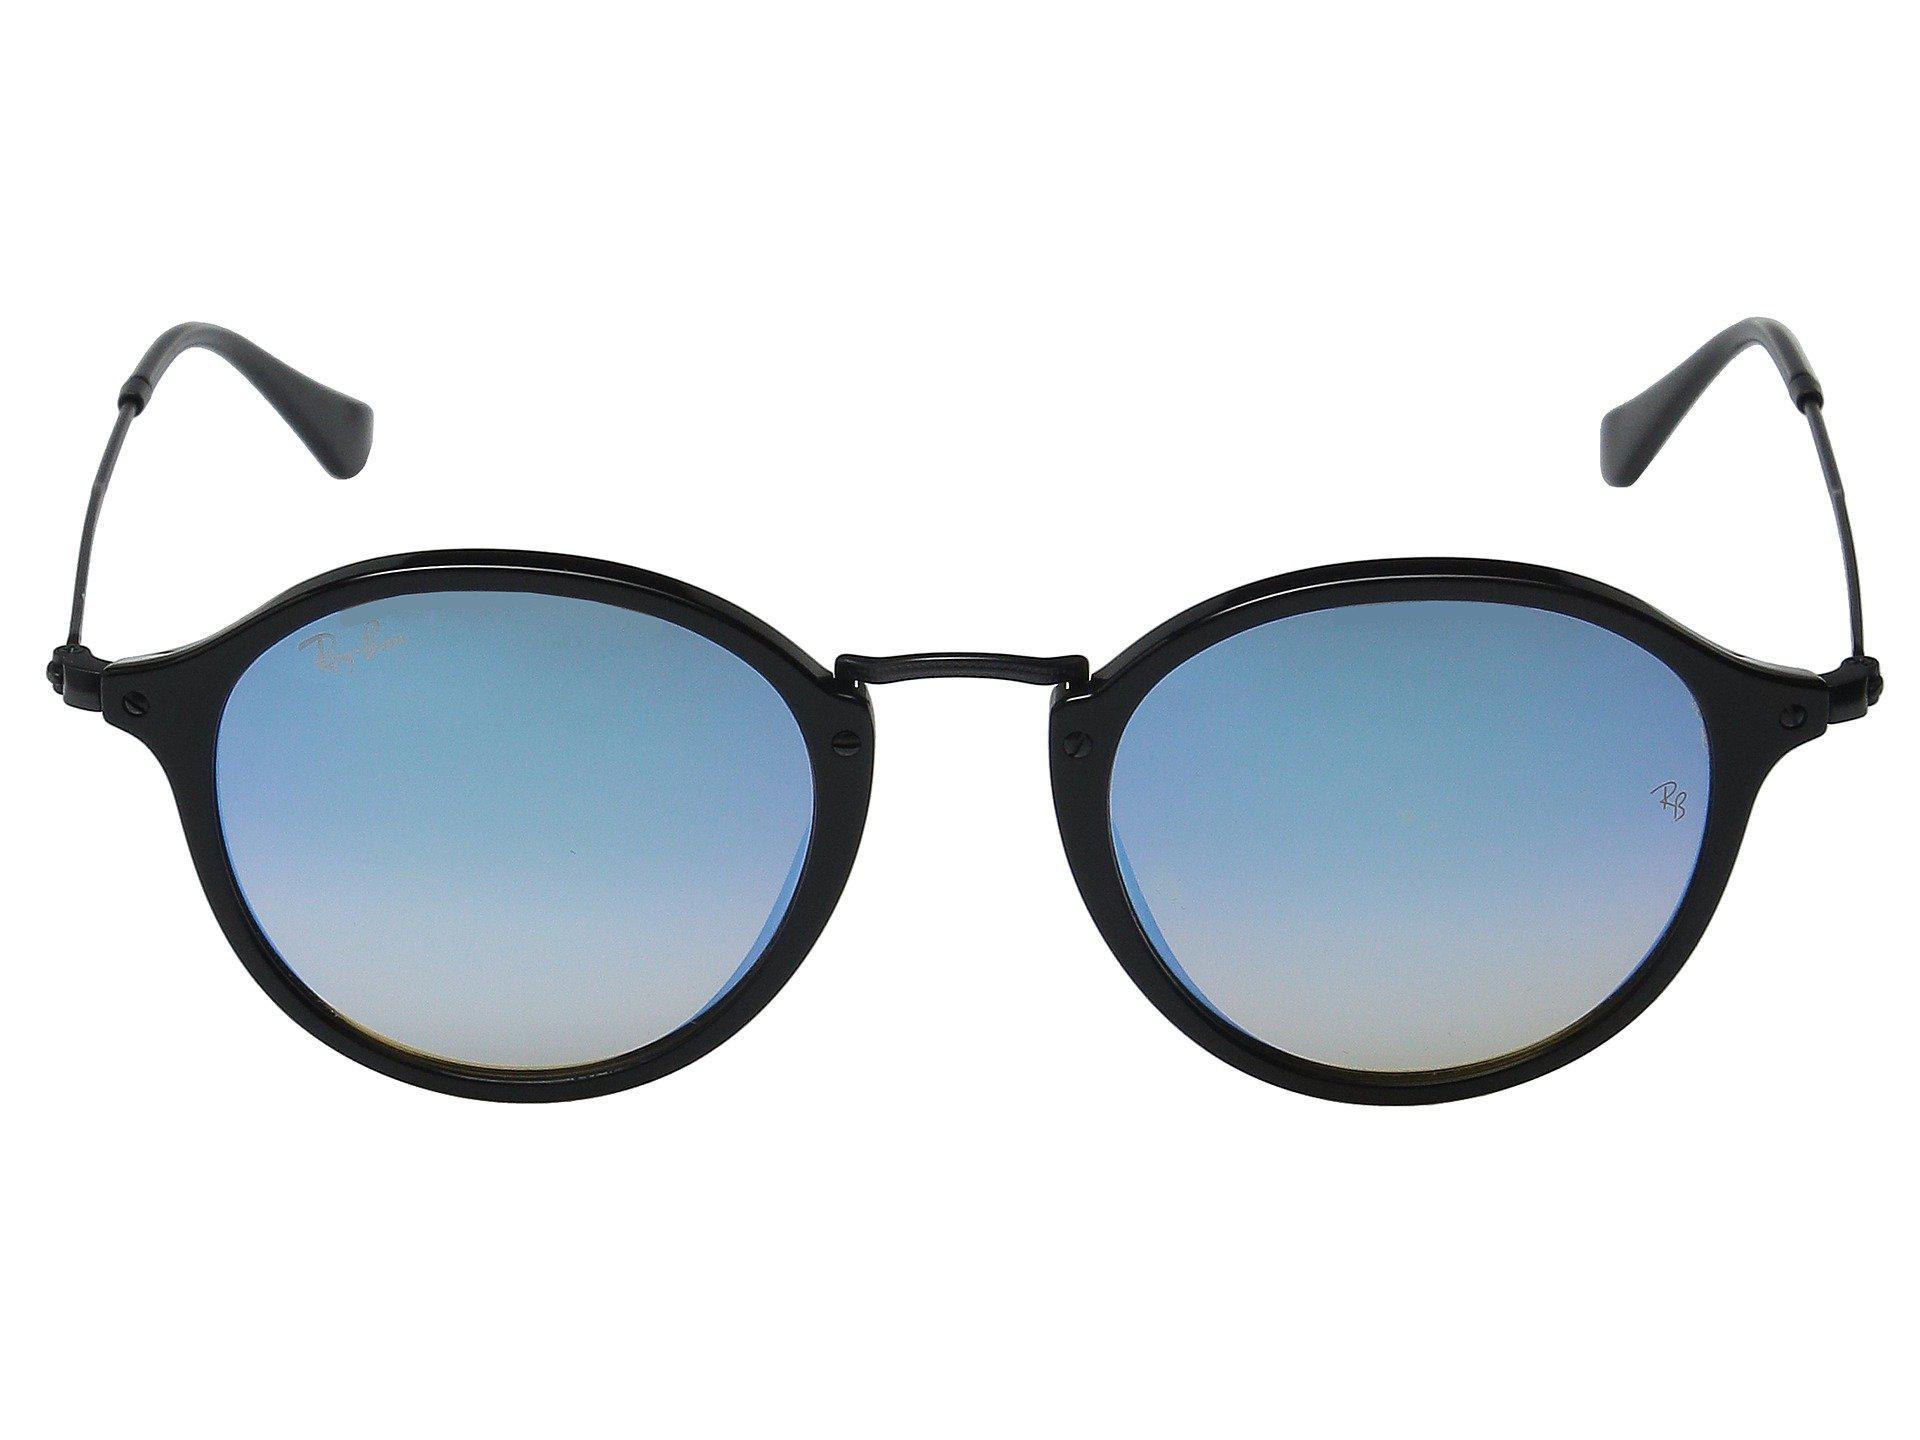 ed0c5d5f6e Ray-Ban - Rb2447 49mm (black Frame mirror Gradient Blue Lens) Fashion. View  fullscreen